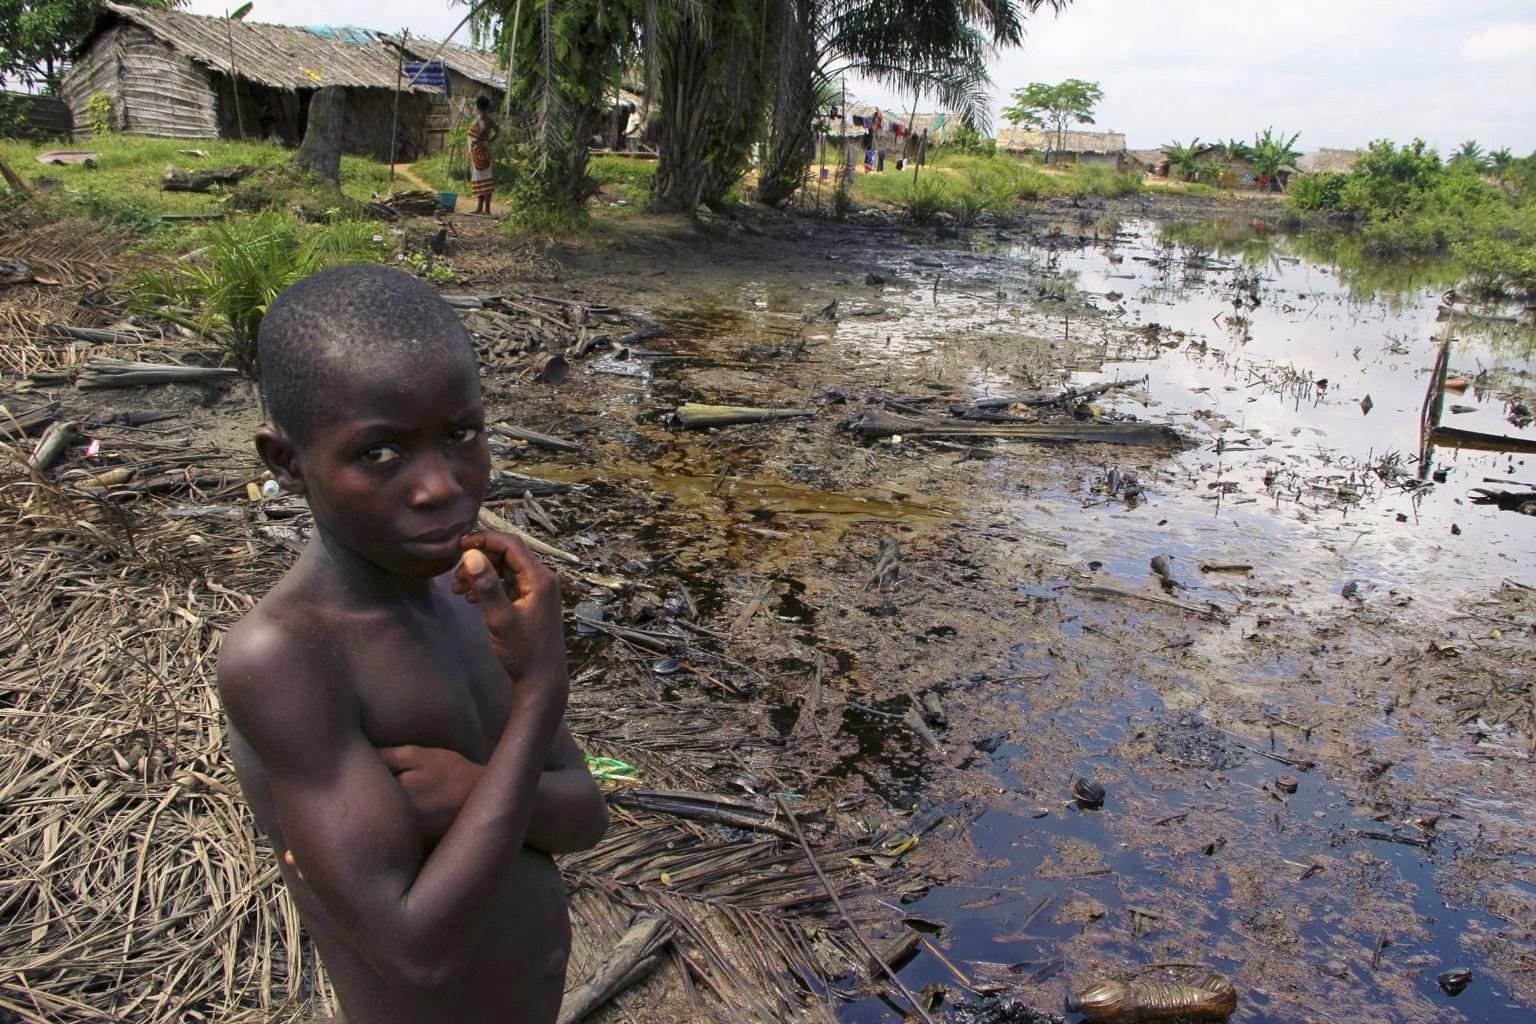 ughe-di-petrolio-in-nigeria-gli-effetti-sui-neonati